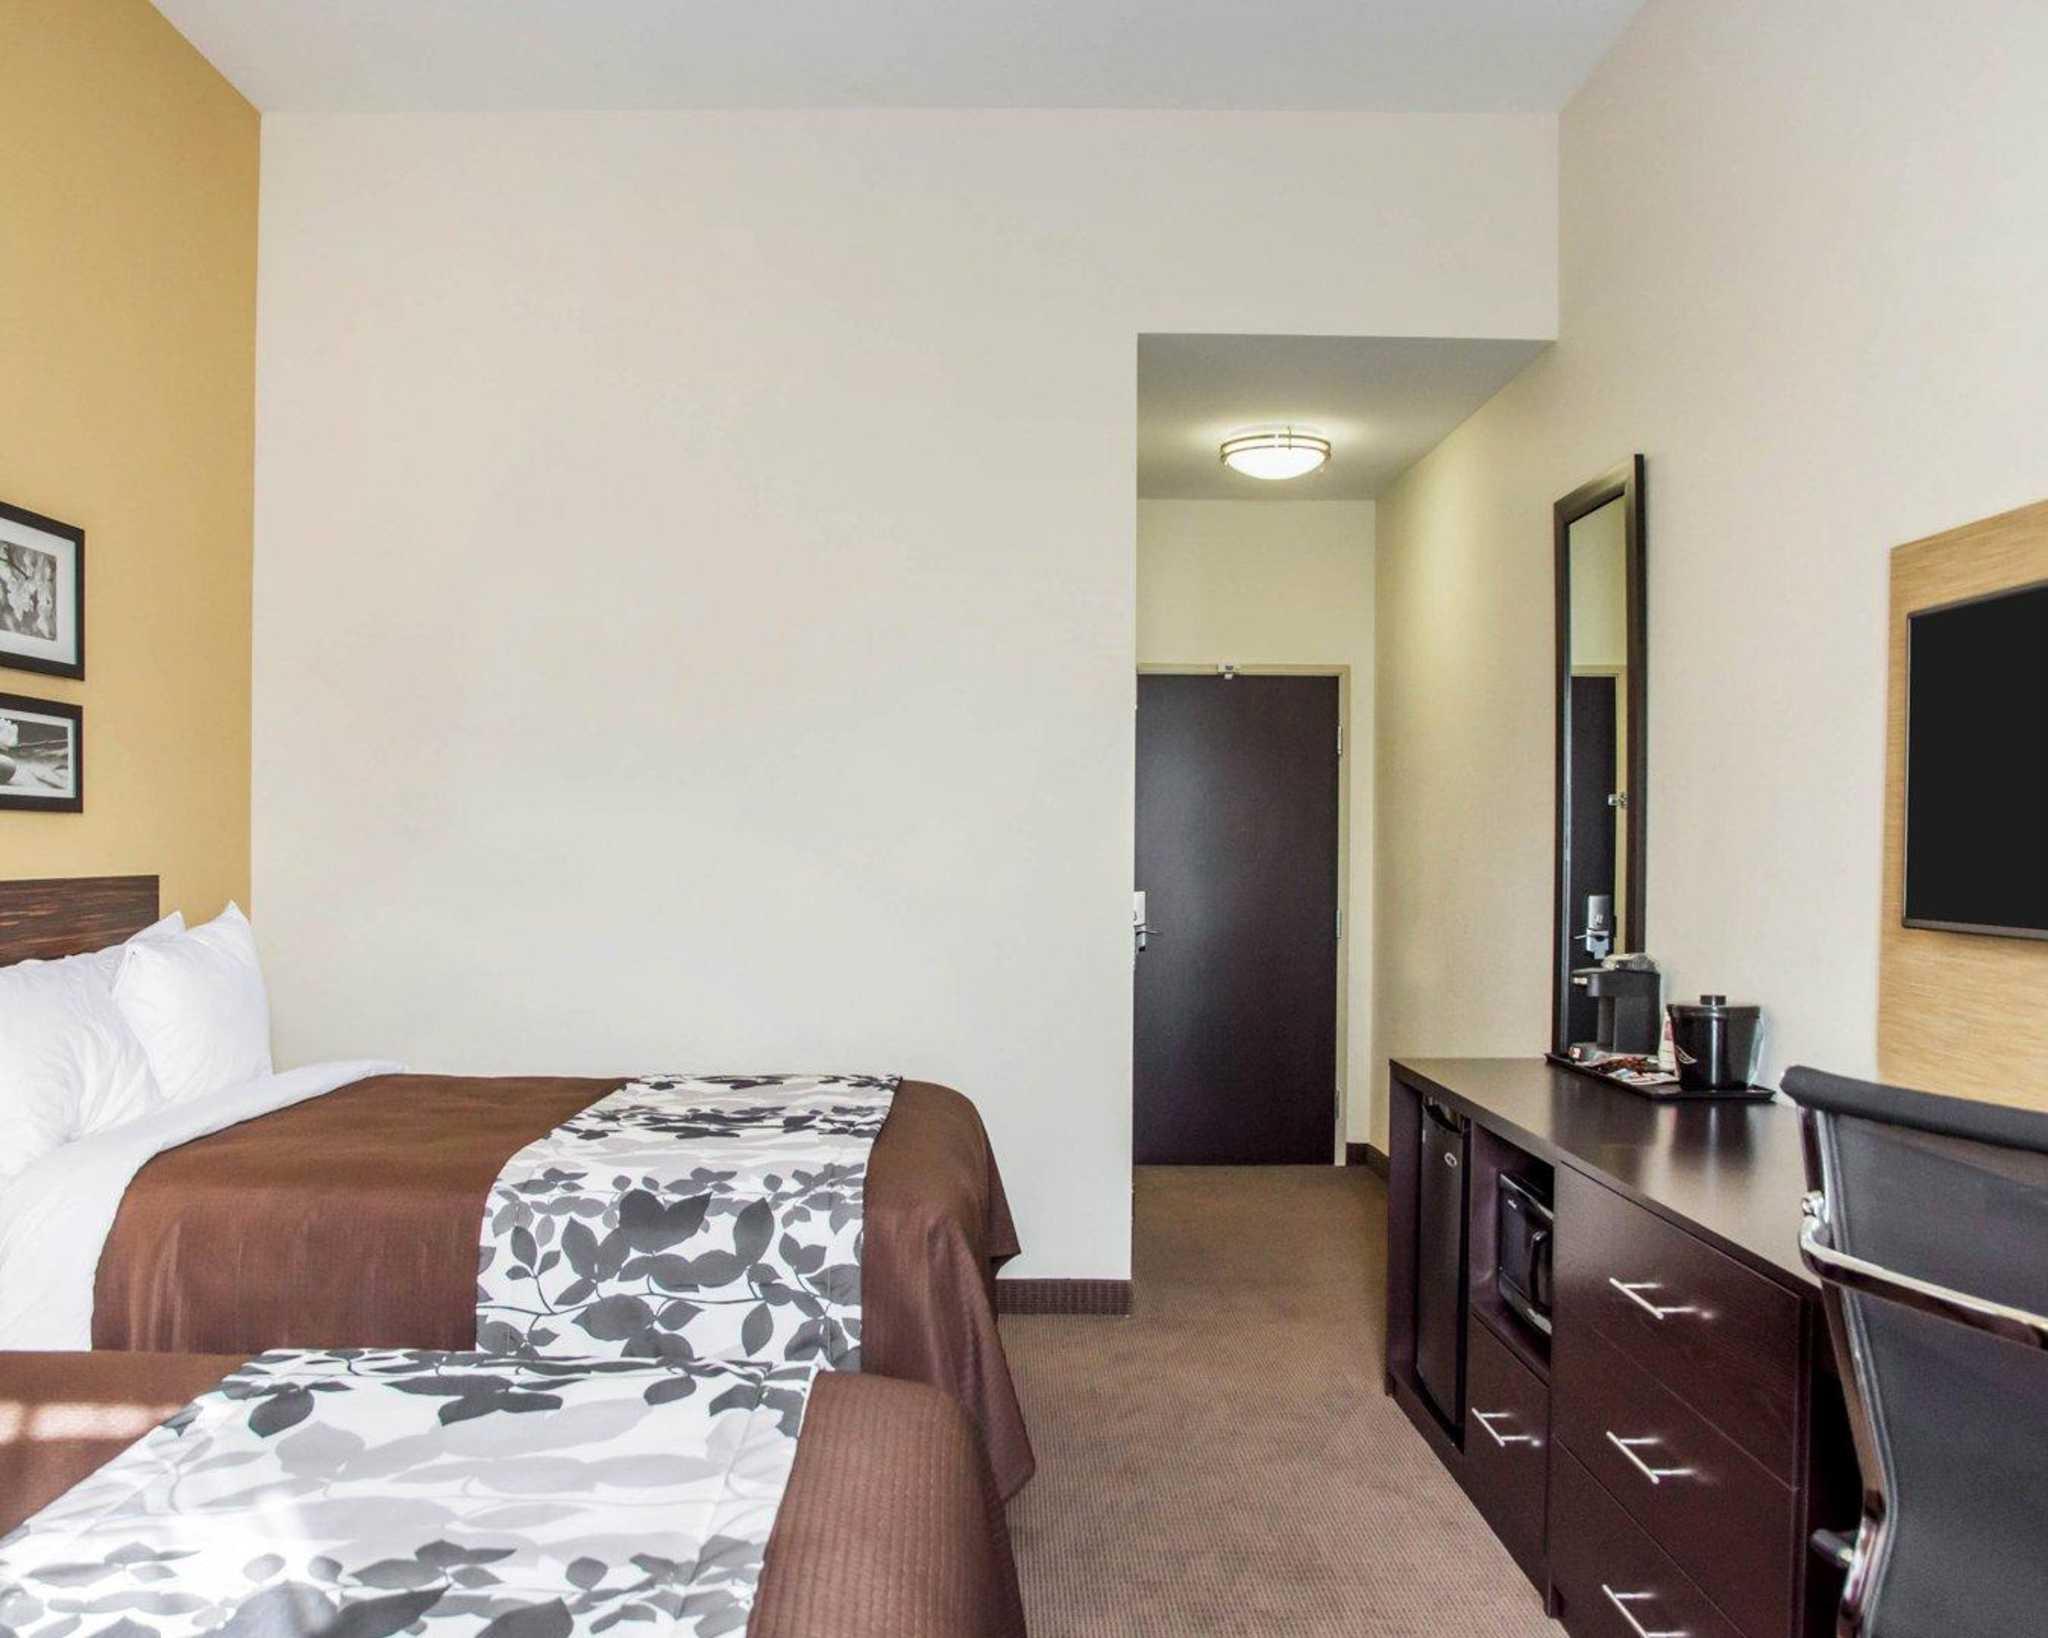 Sleep Inn & Suites Parkersburg-Marietta image 1